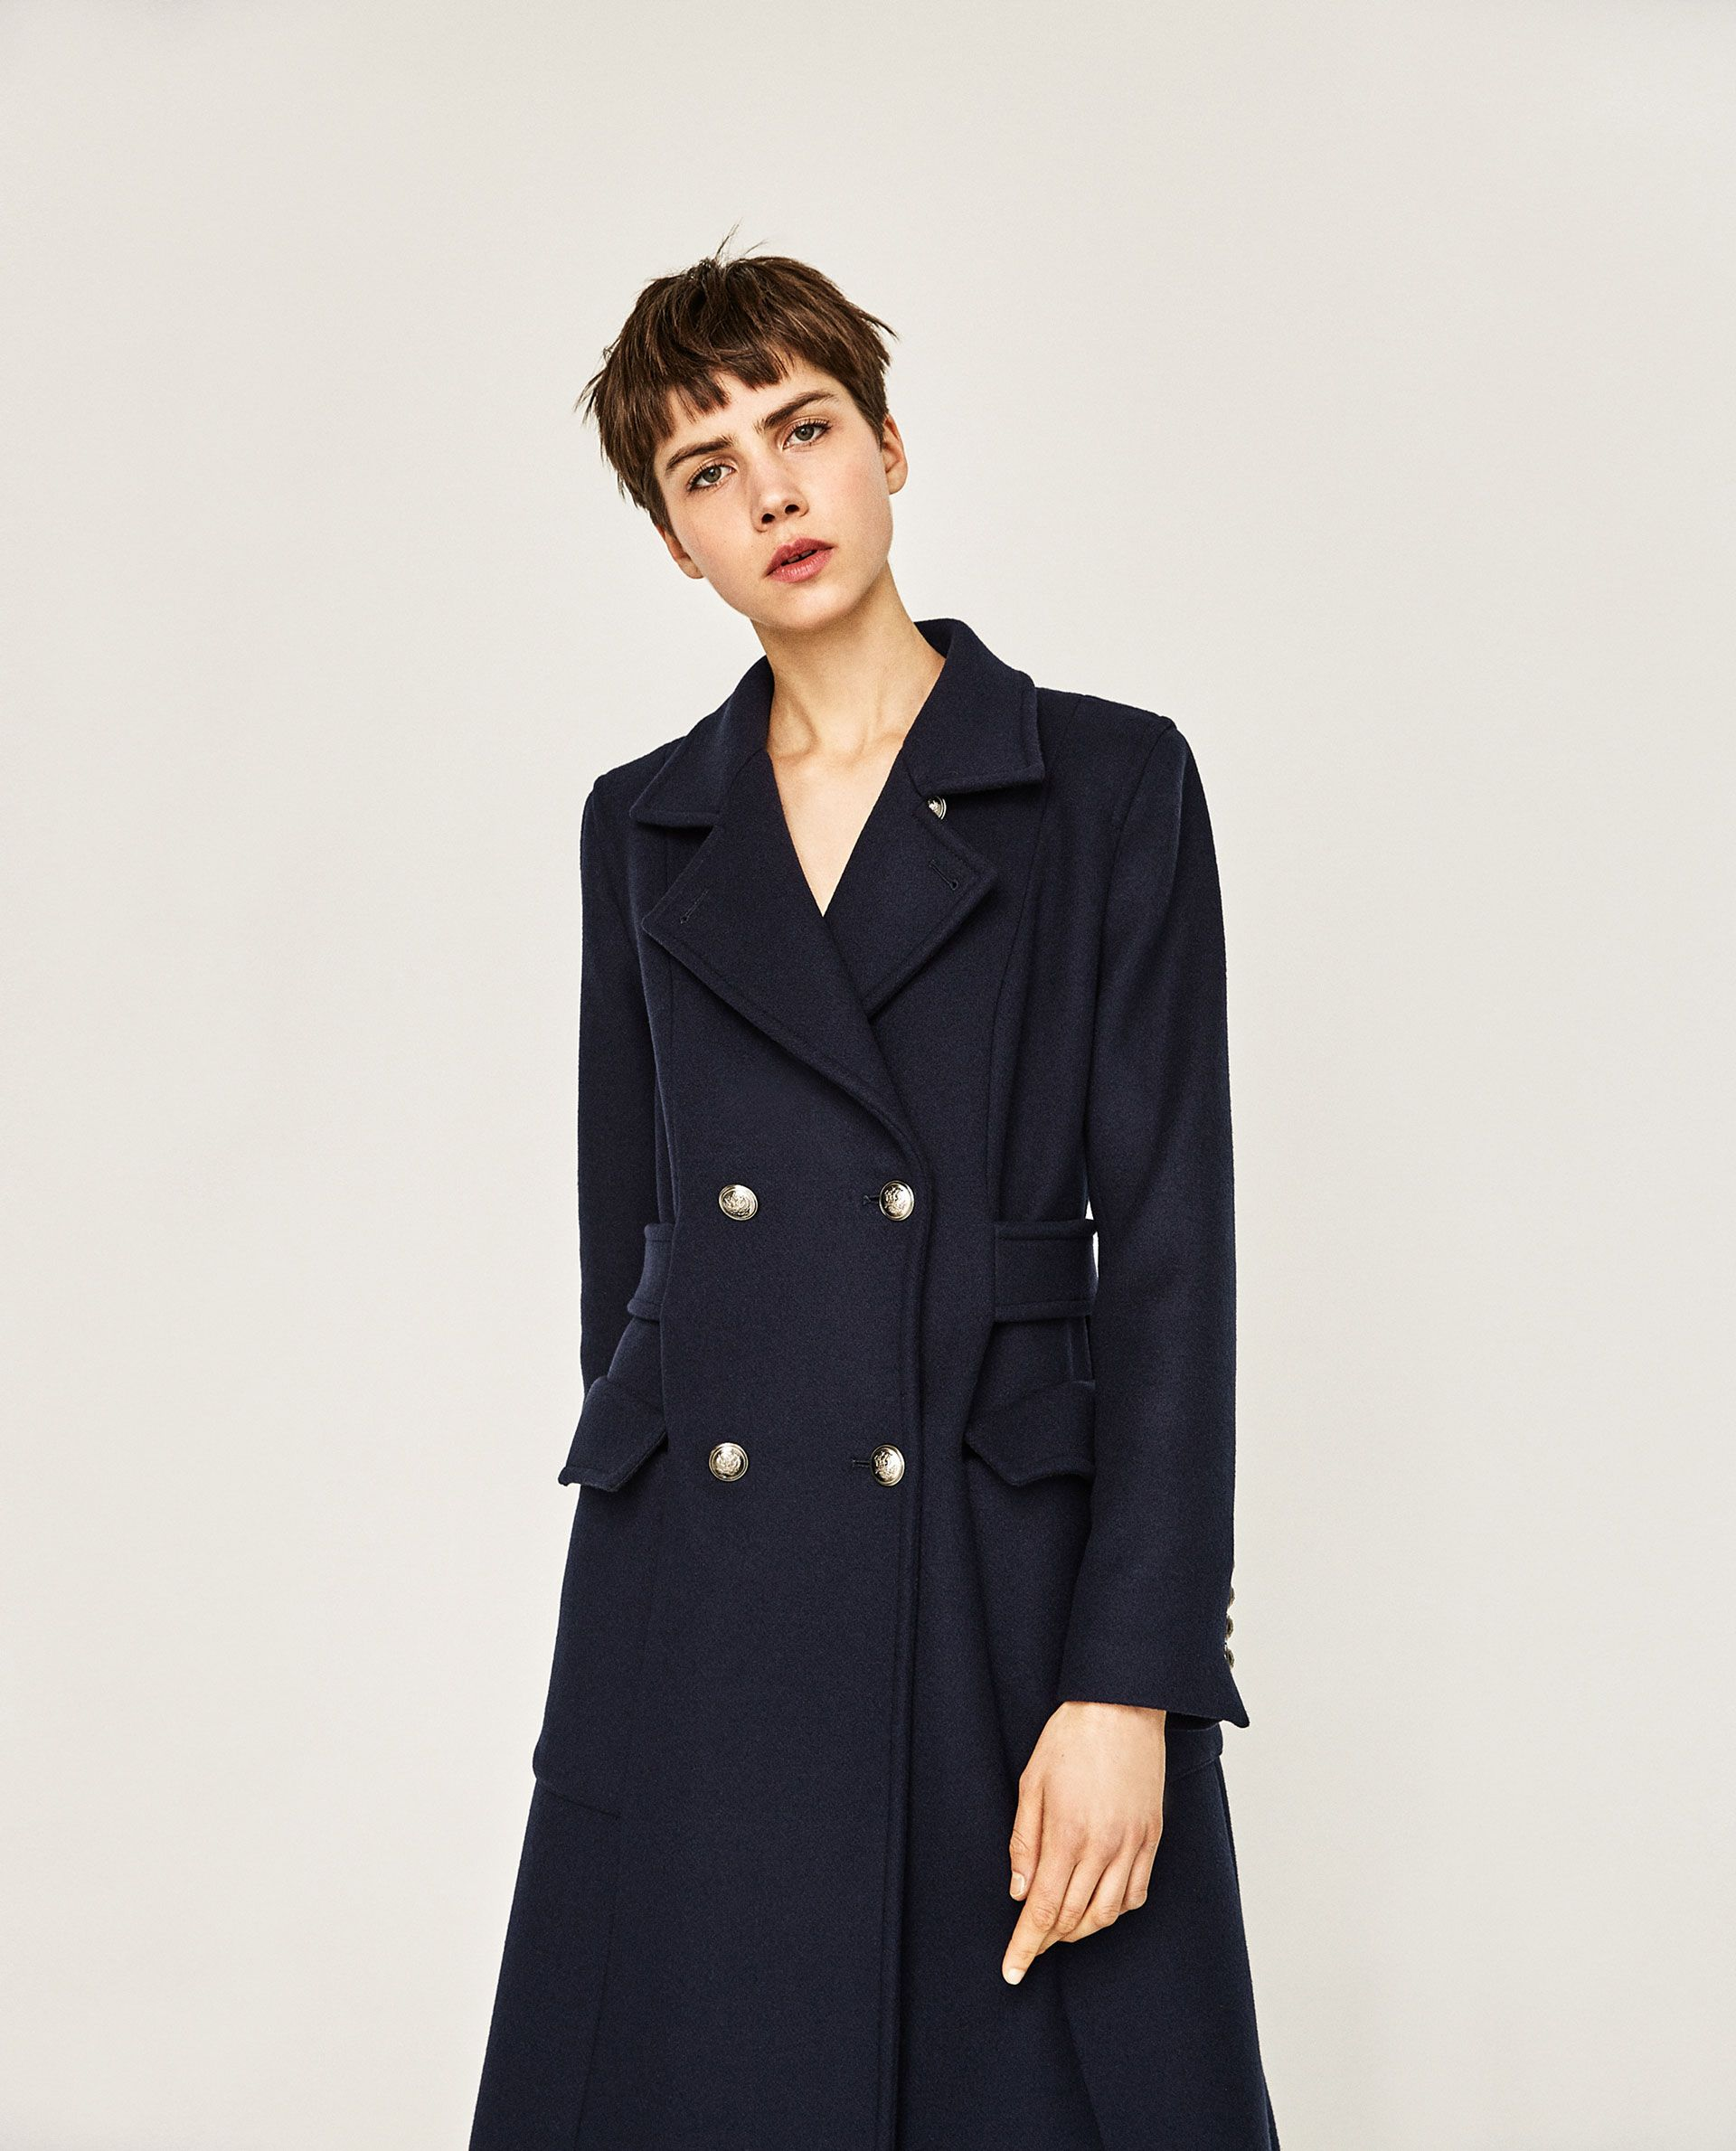 Como hacer un abrigo largo de mujer